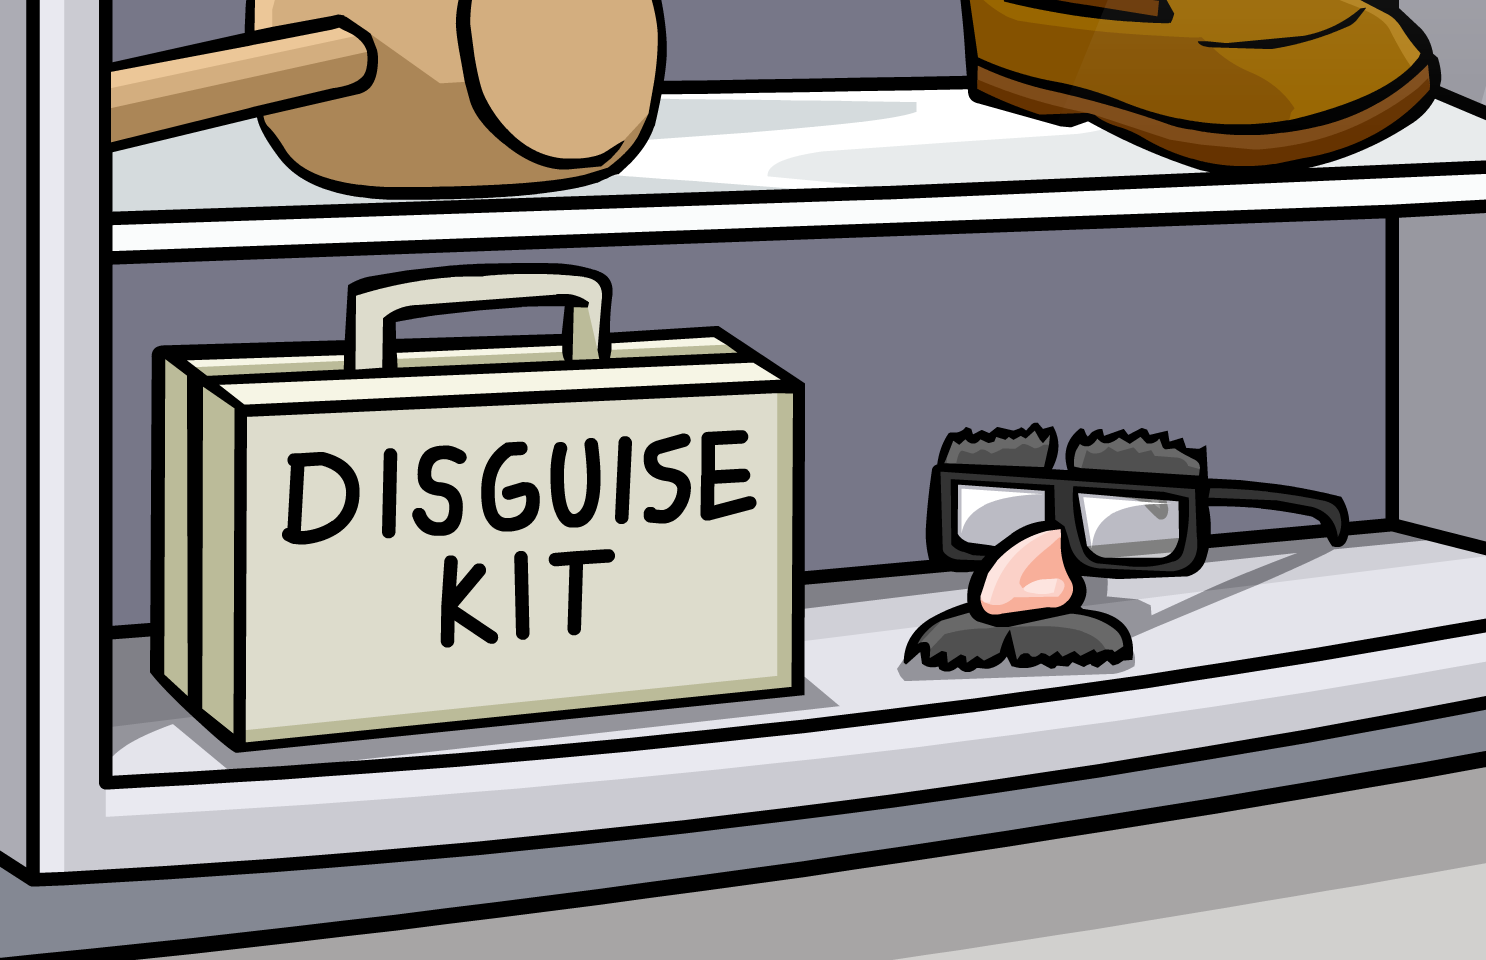 Disguise Kit